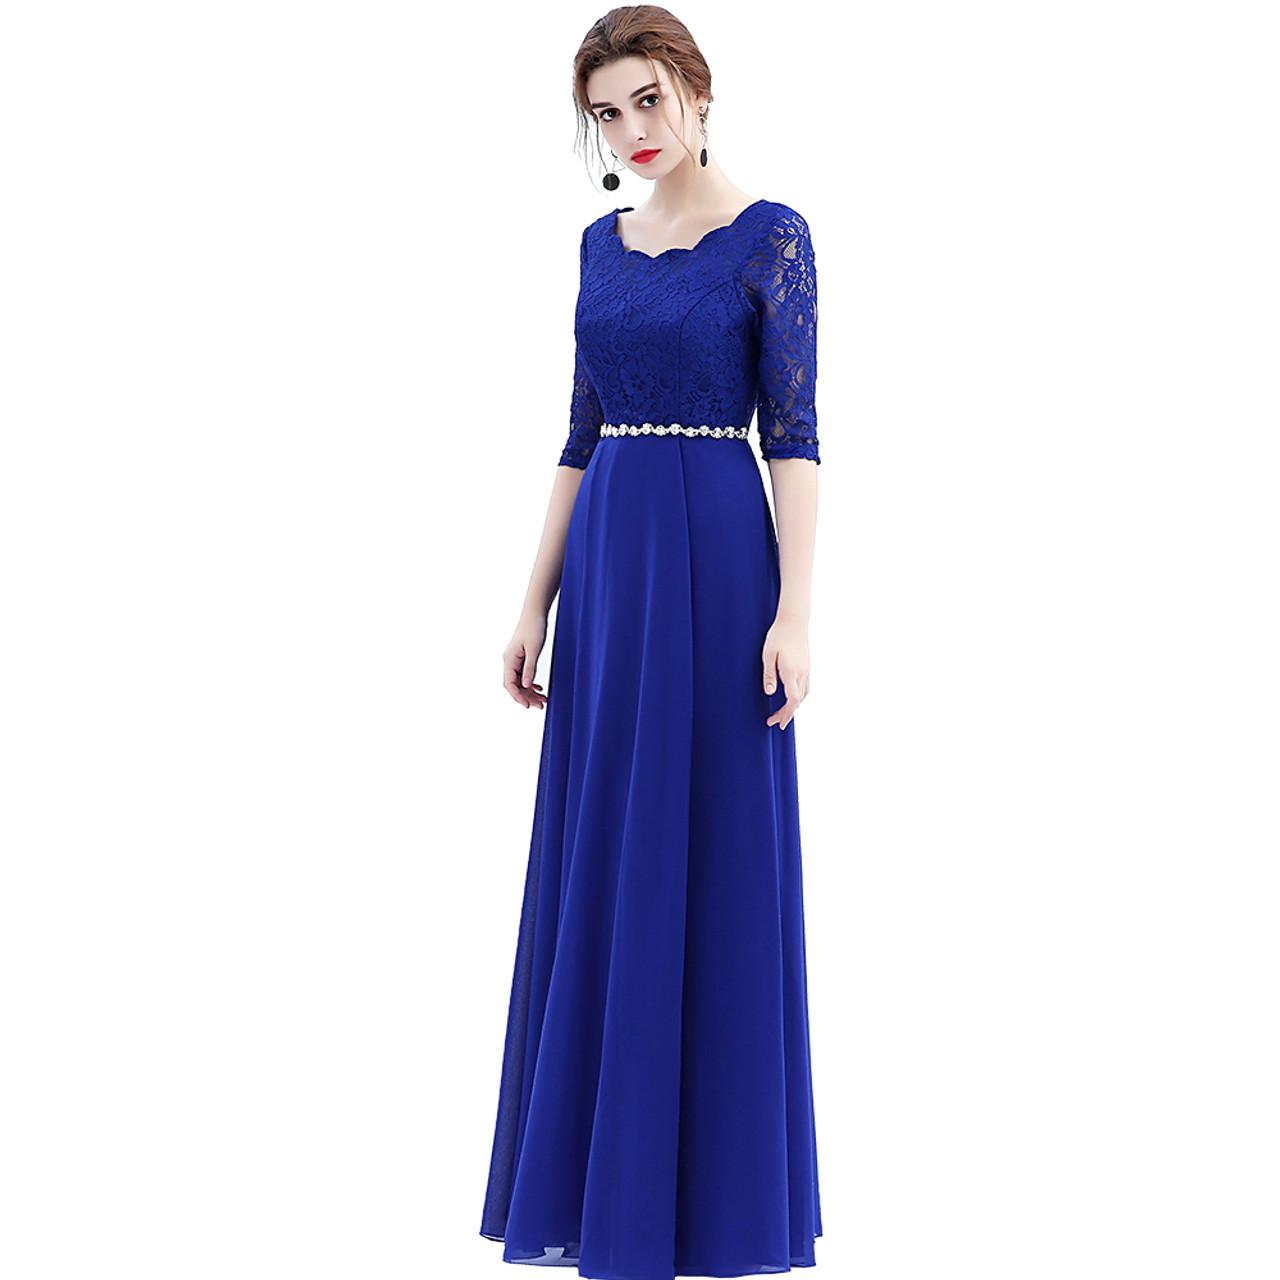 a6cd59f7183 ... 2018 Custom Made Elegant Black Winter Evening Dresses Lace Half Sleeve  Robe De Soiree Long Vestido ...